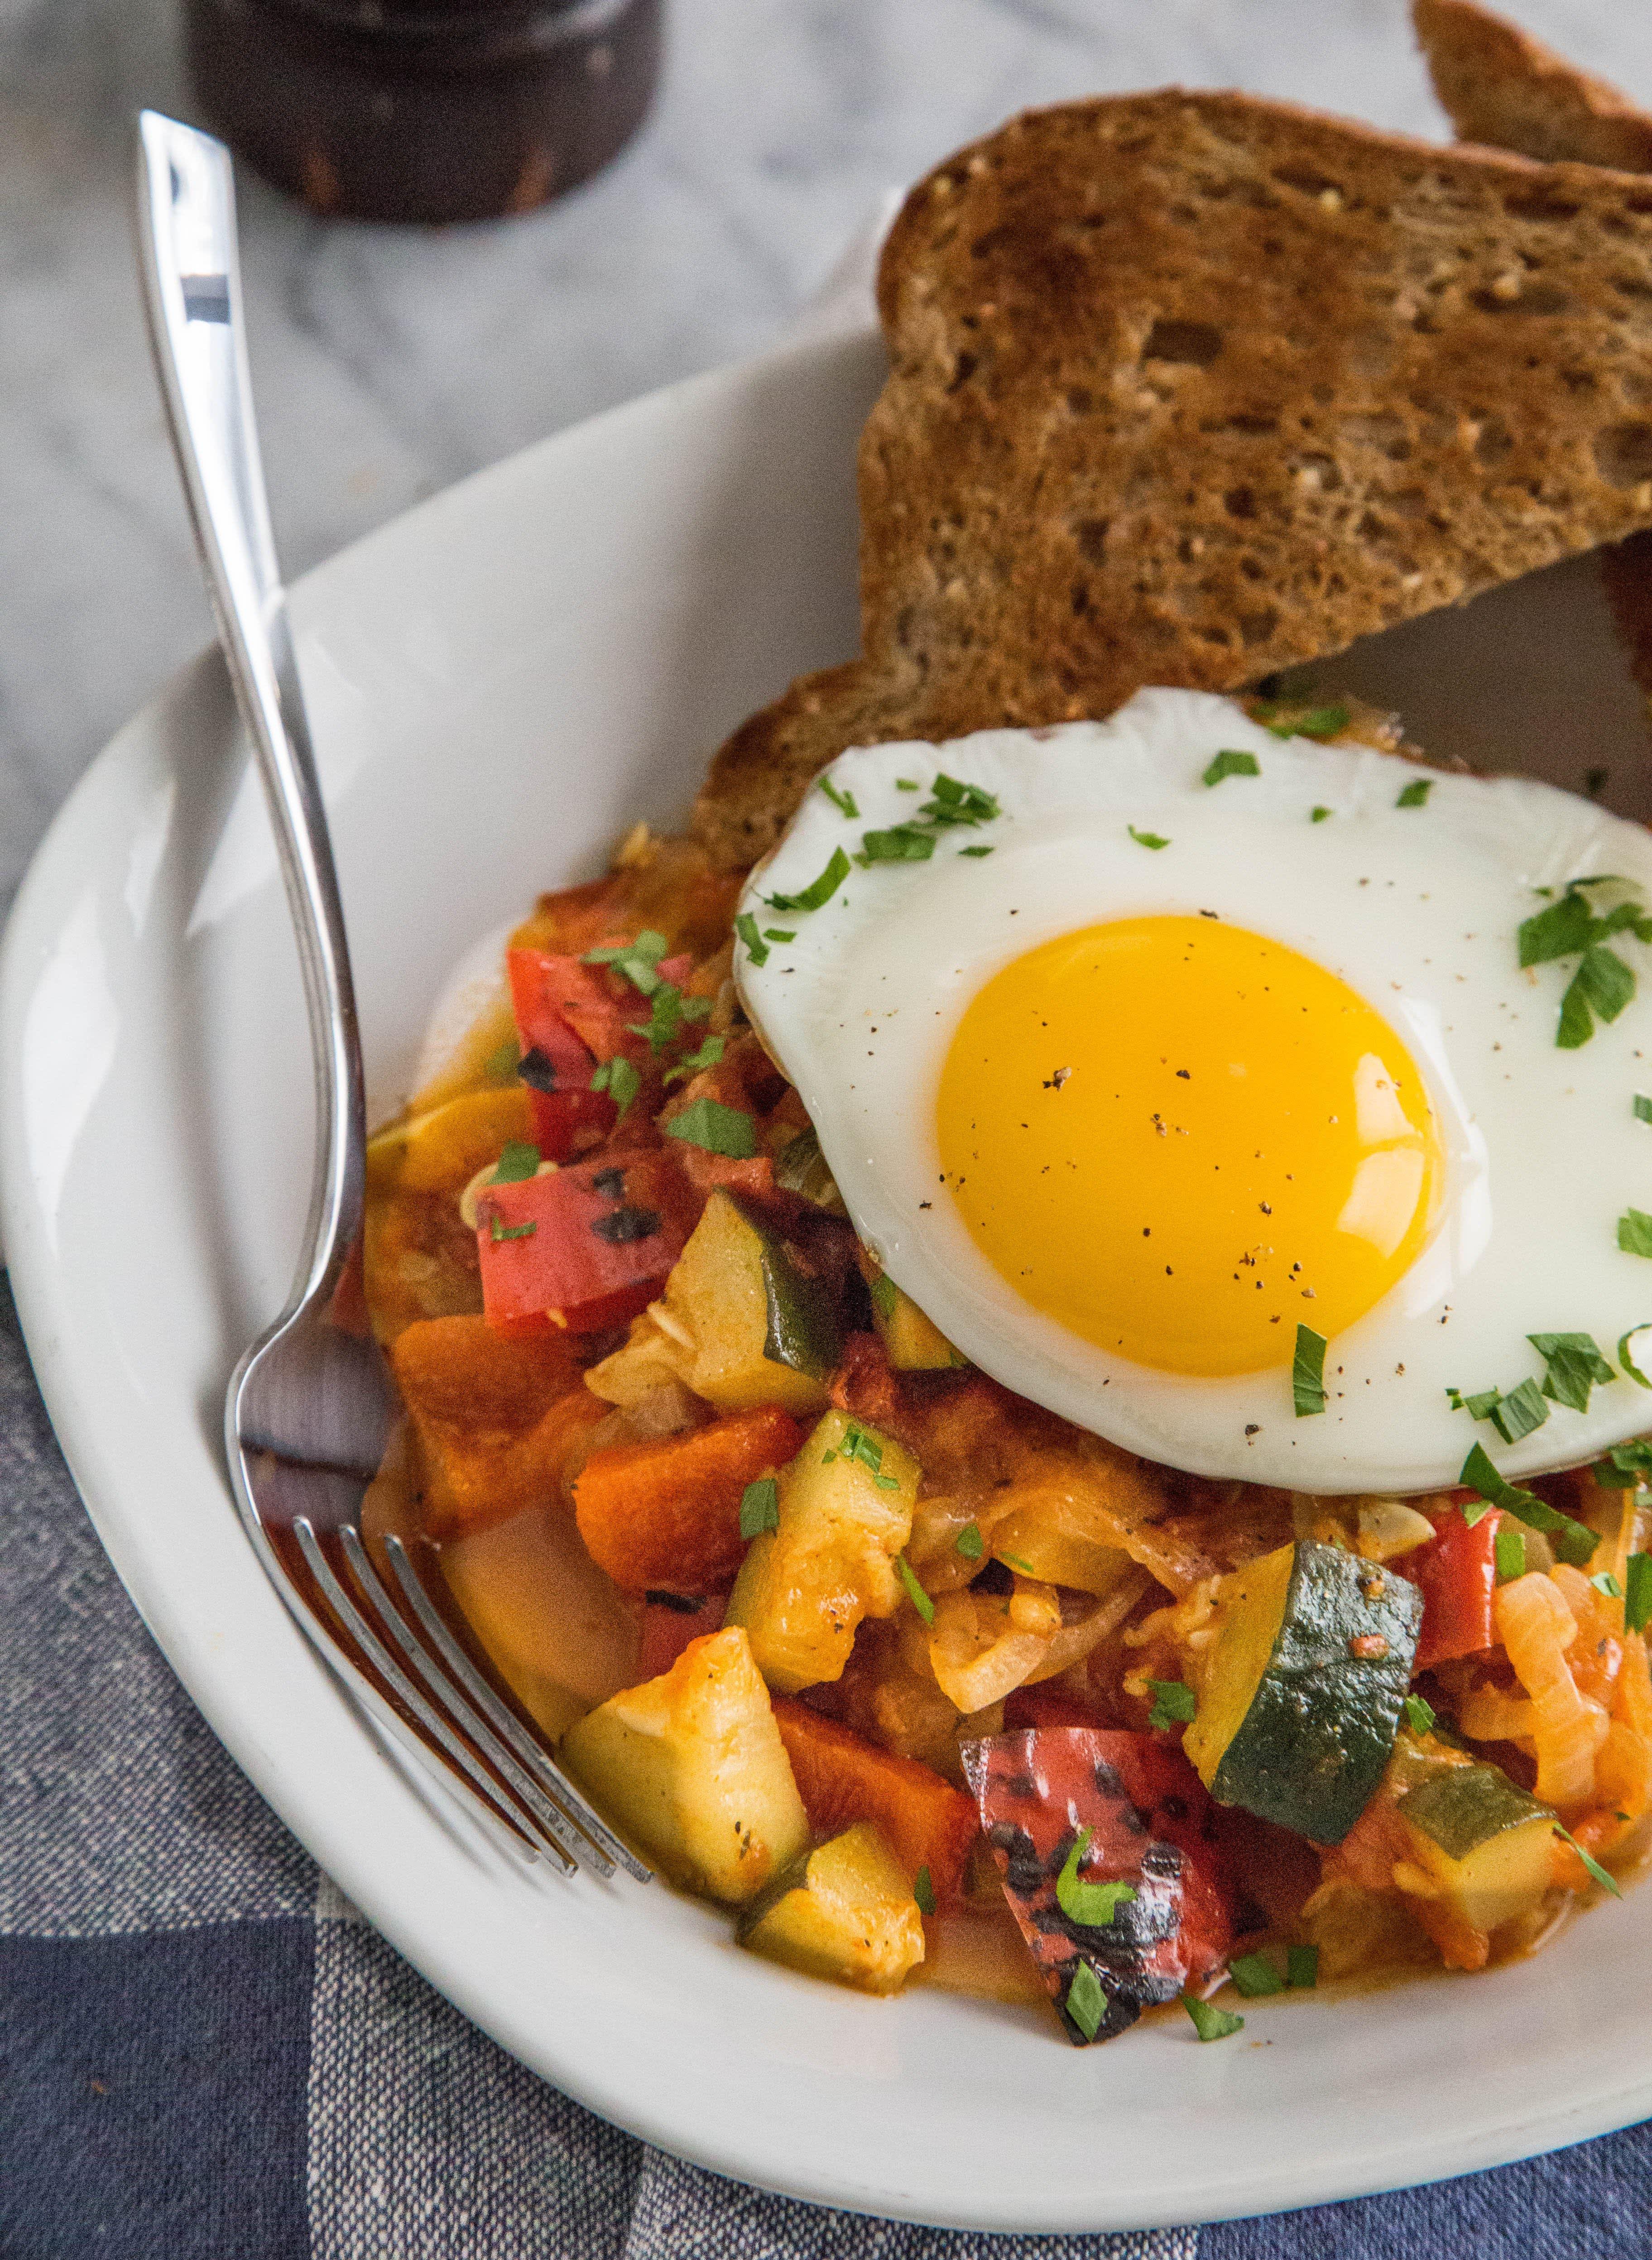 Piperade-Ratatouille and Eggs